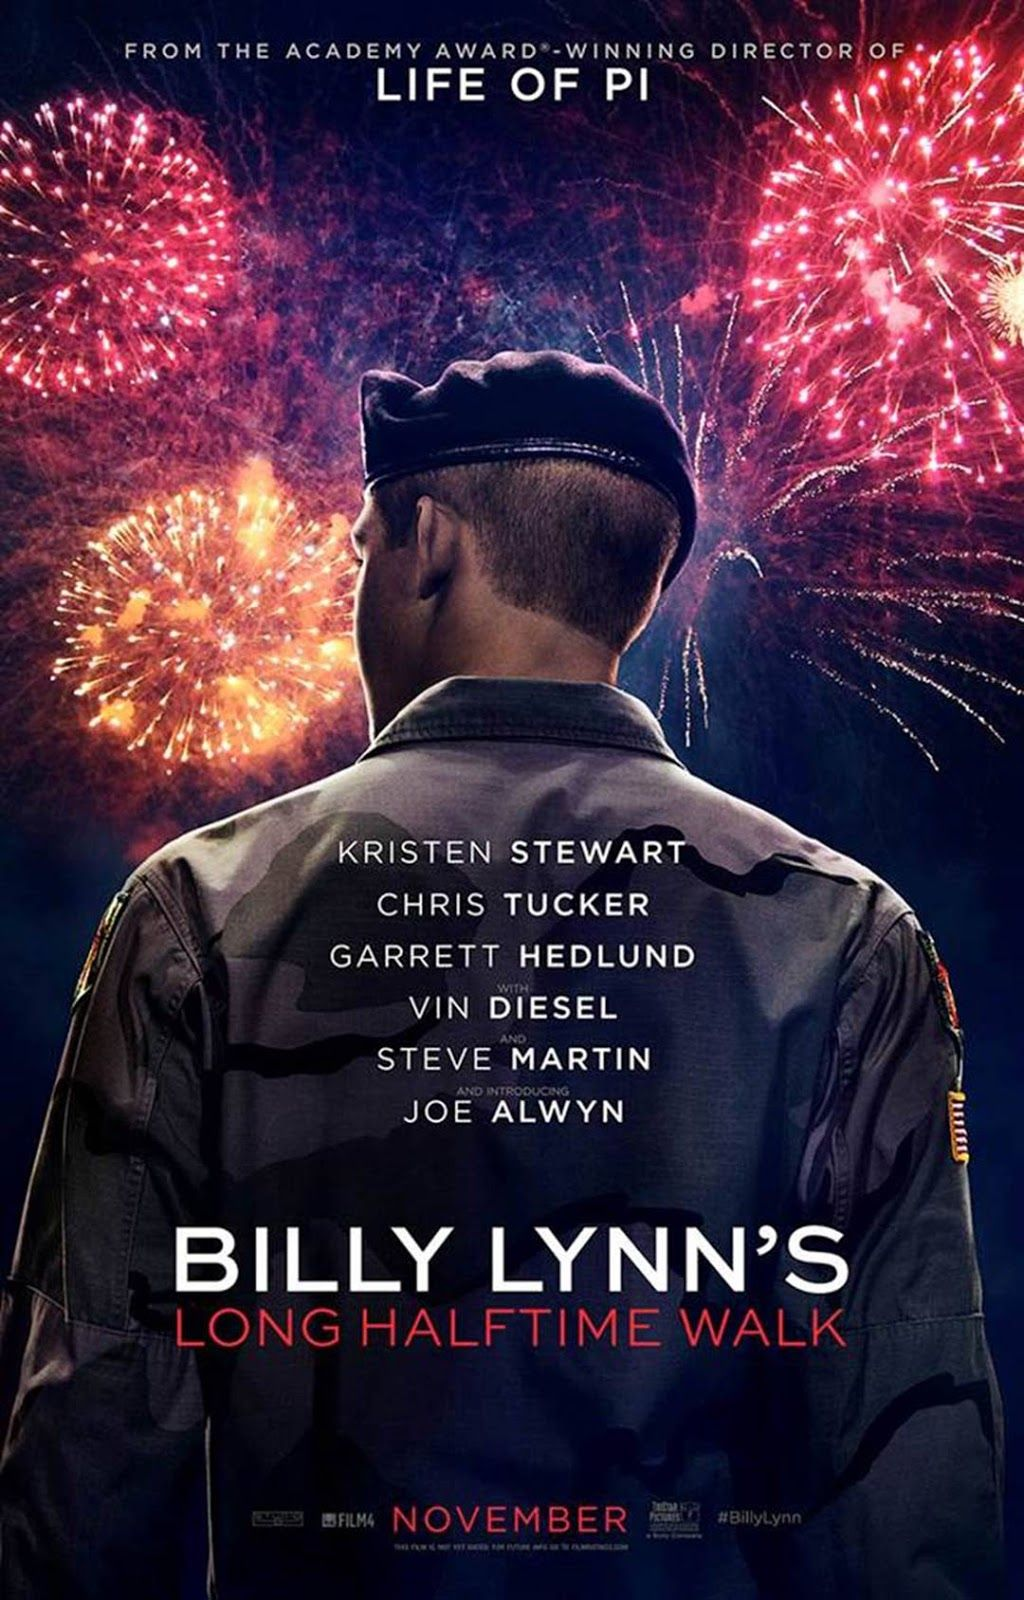 Billy Lynn's Long Halftime Walk Poster & Trailer